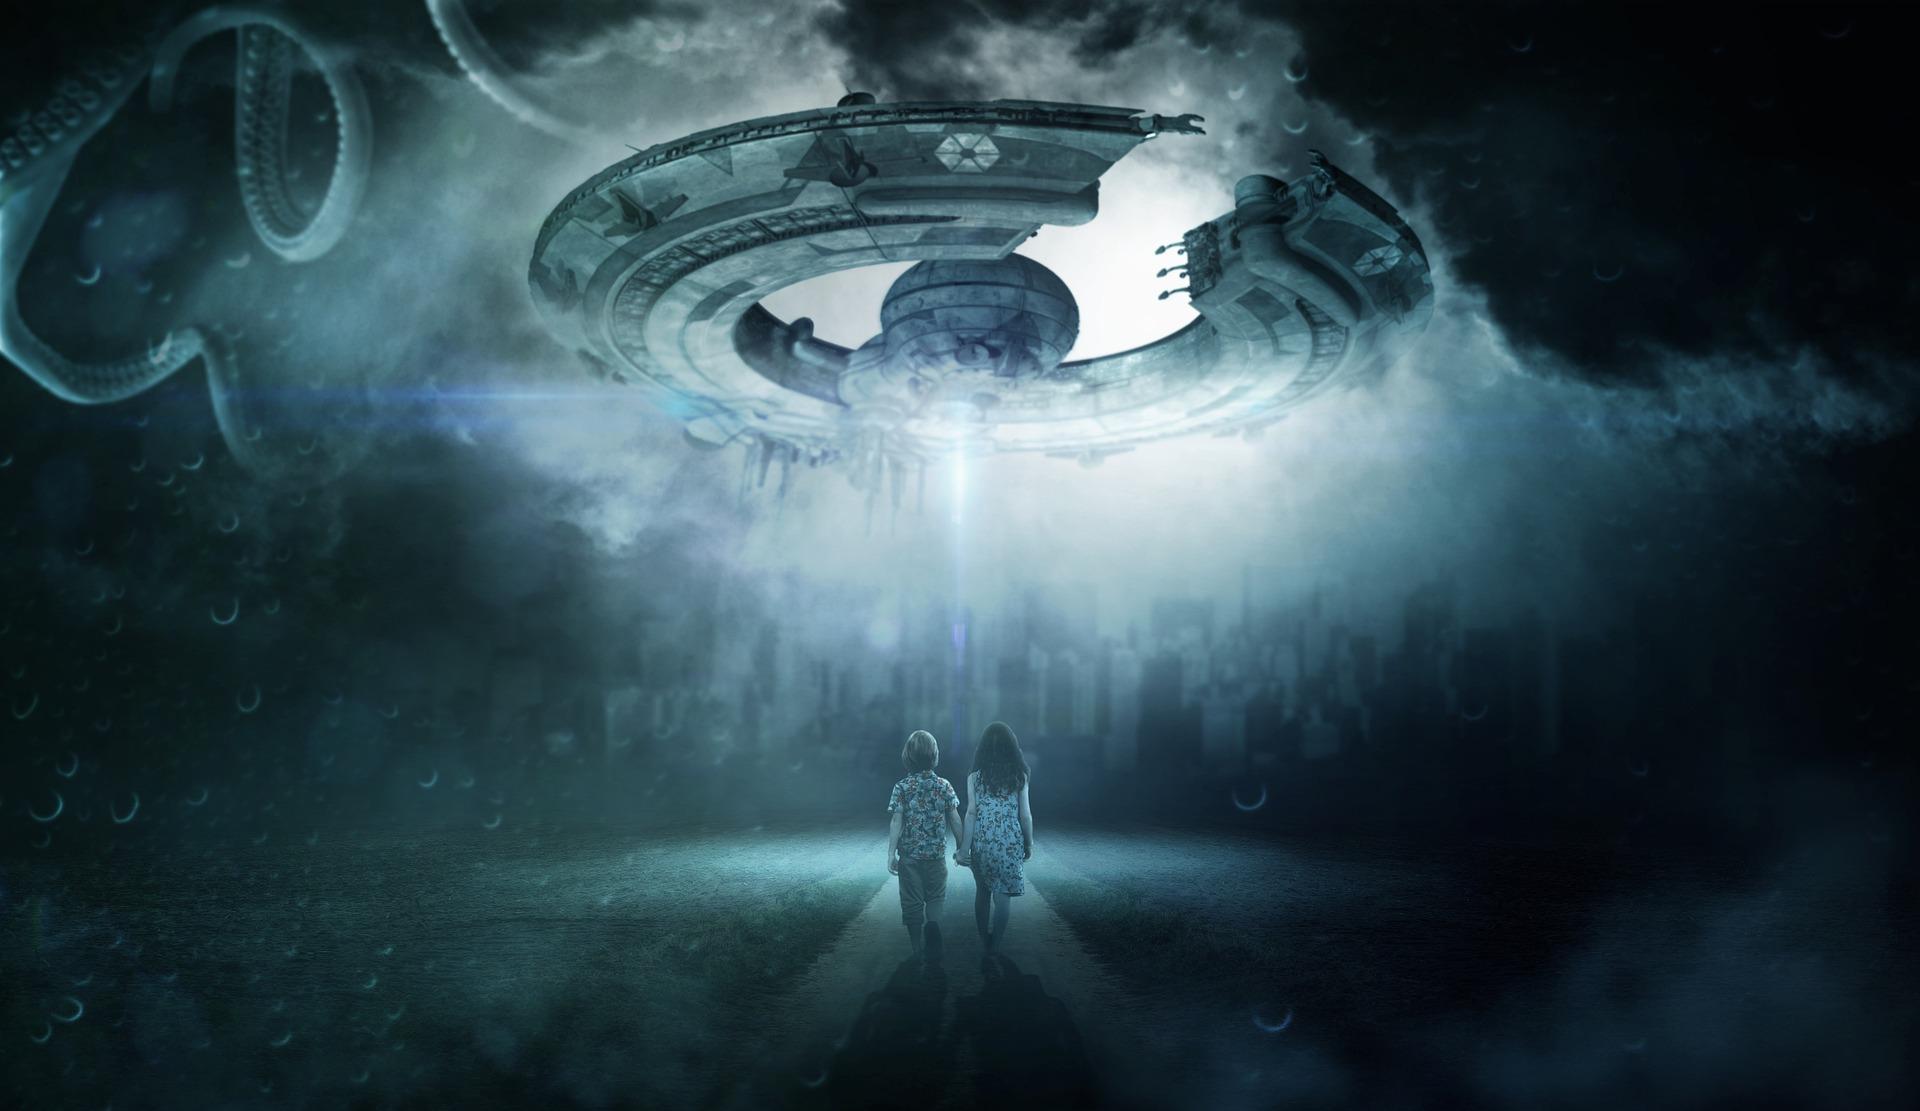 ufo-3014638_1920